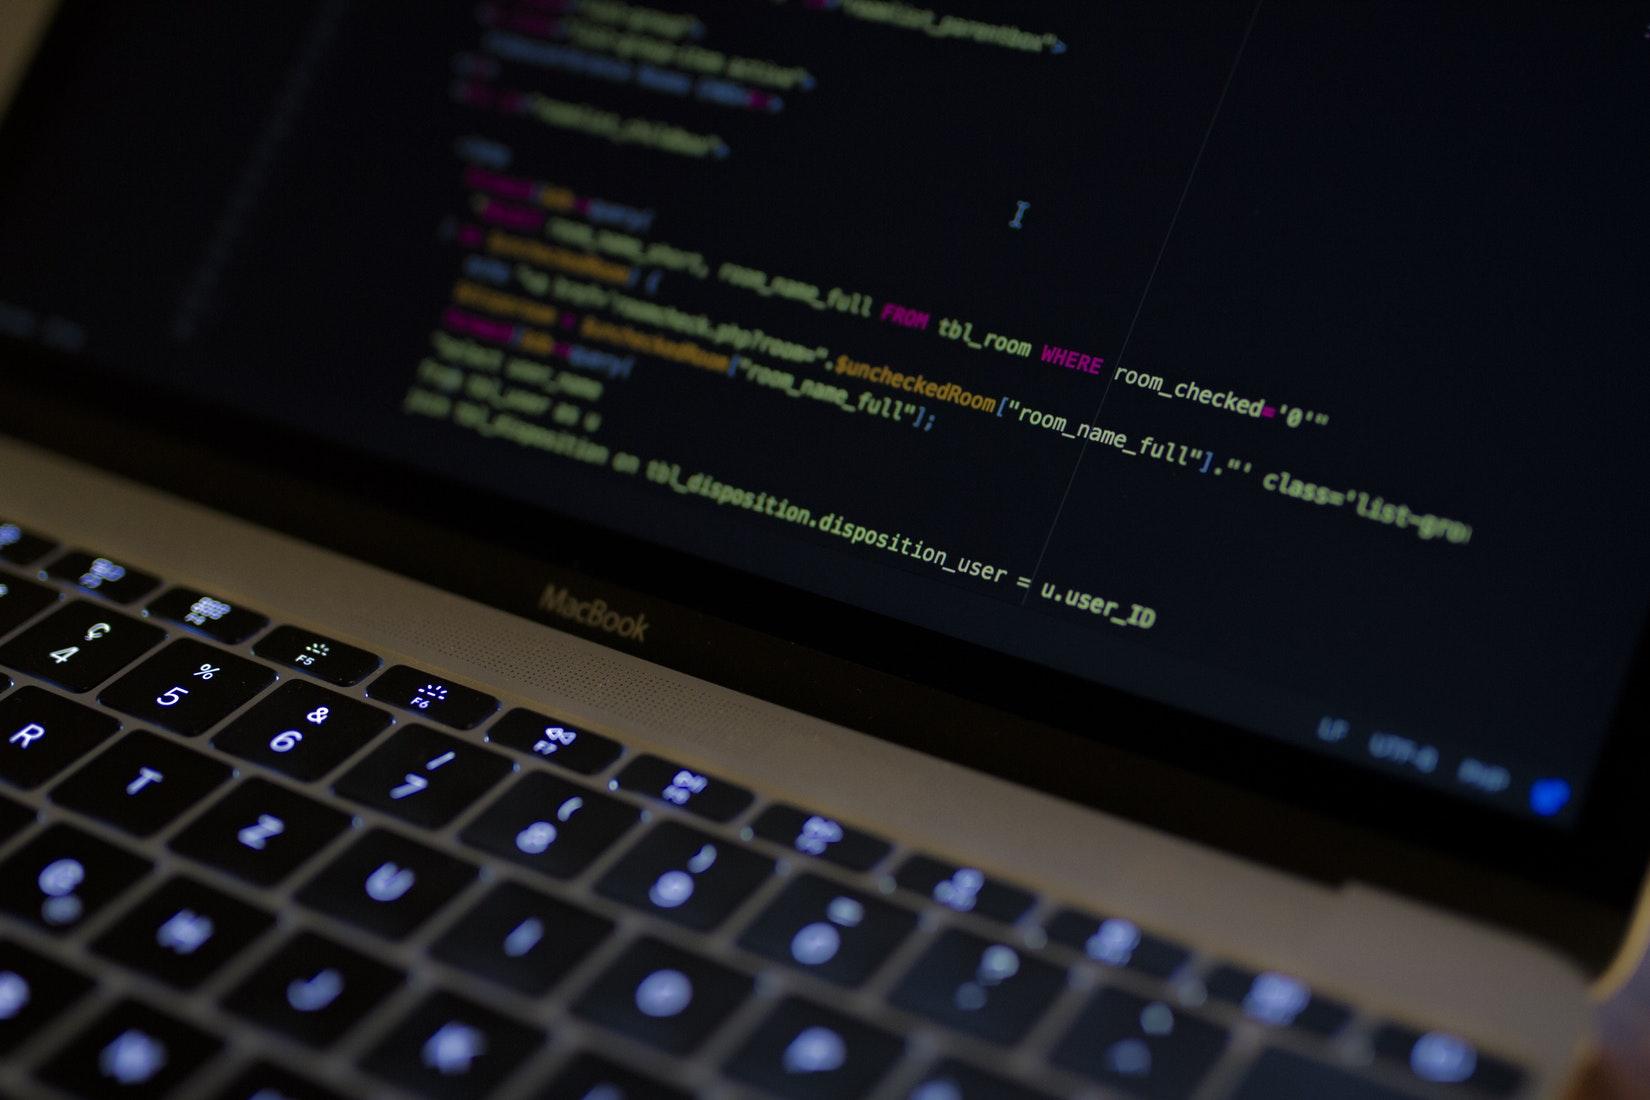 SpringBoot 使用 MyBatis 分页插件 PageHelper 进行分页查询